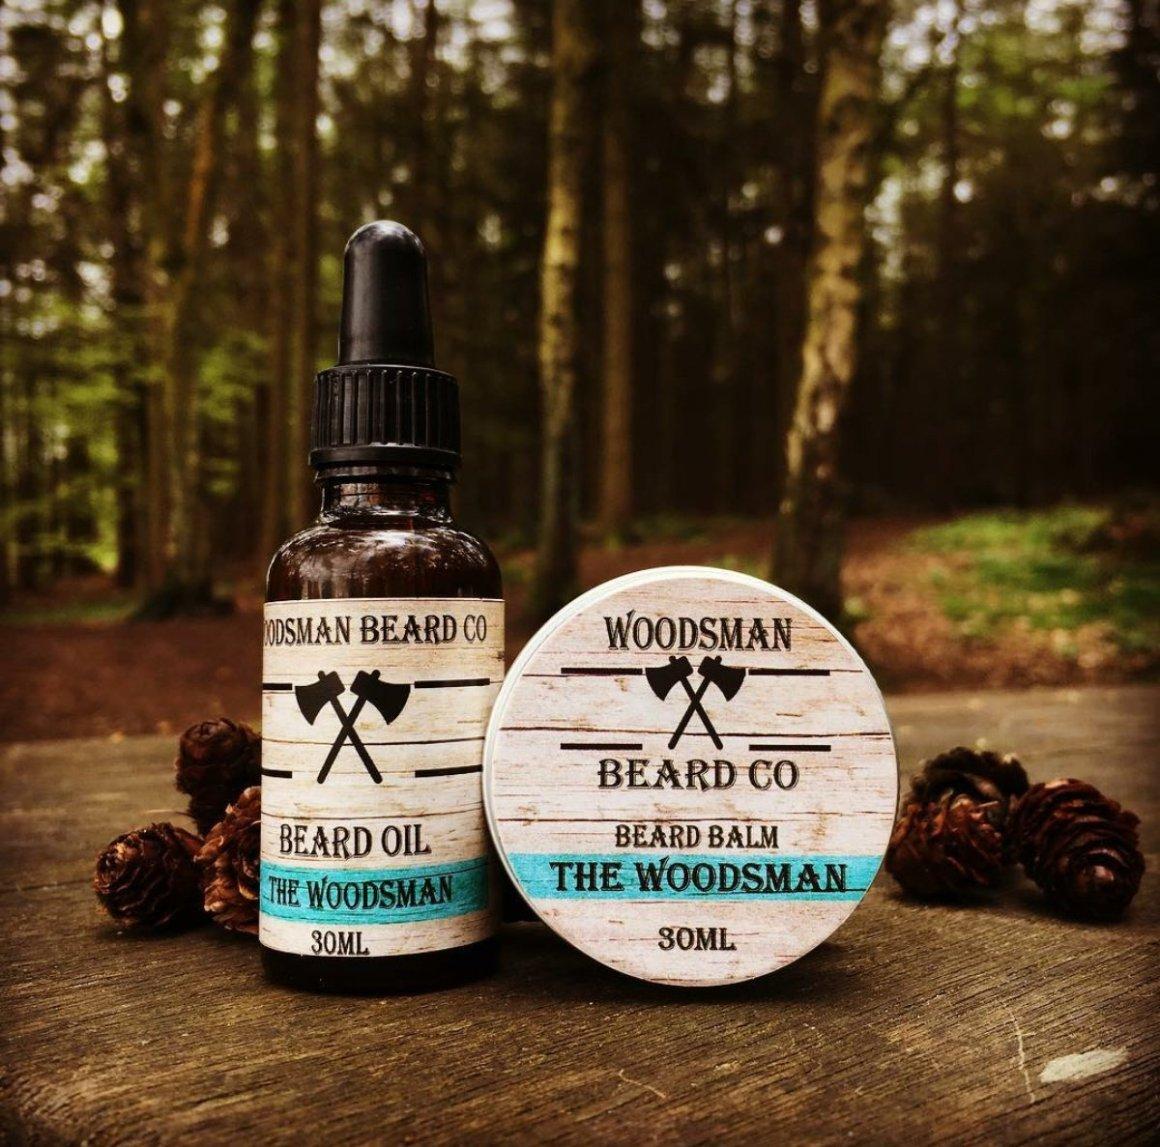 Review of Woodsman Beard Co The Woodsman Beard Oil & Balm